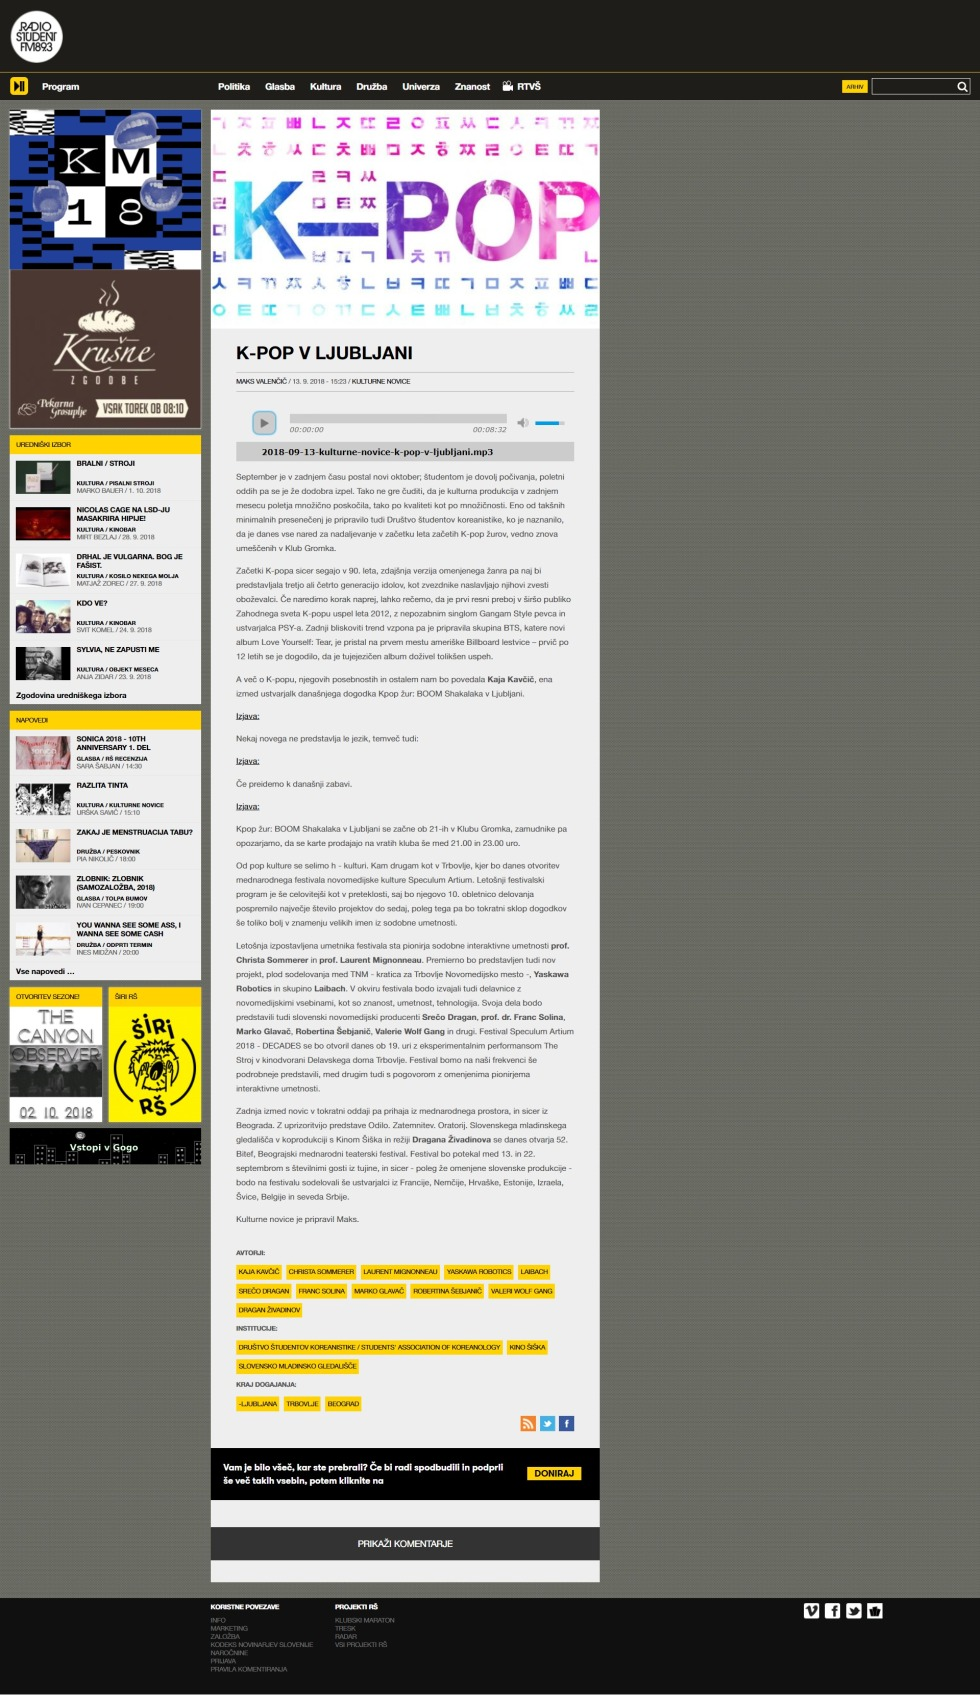 screencapture-radiostudent-si-kultura-kulturne-novice-k-pop-v-ljubljani-2018-10-02-14_05_53.jpg